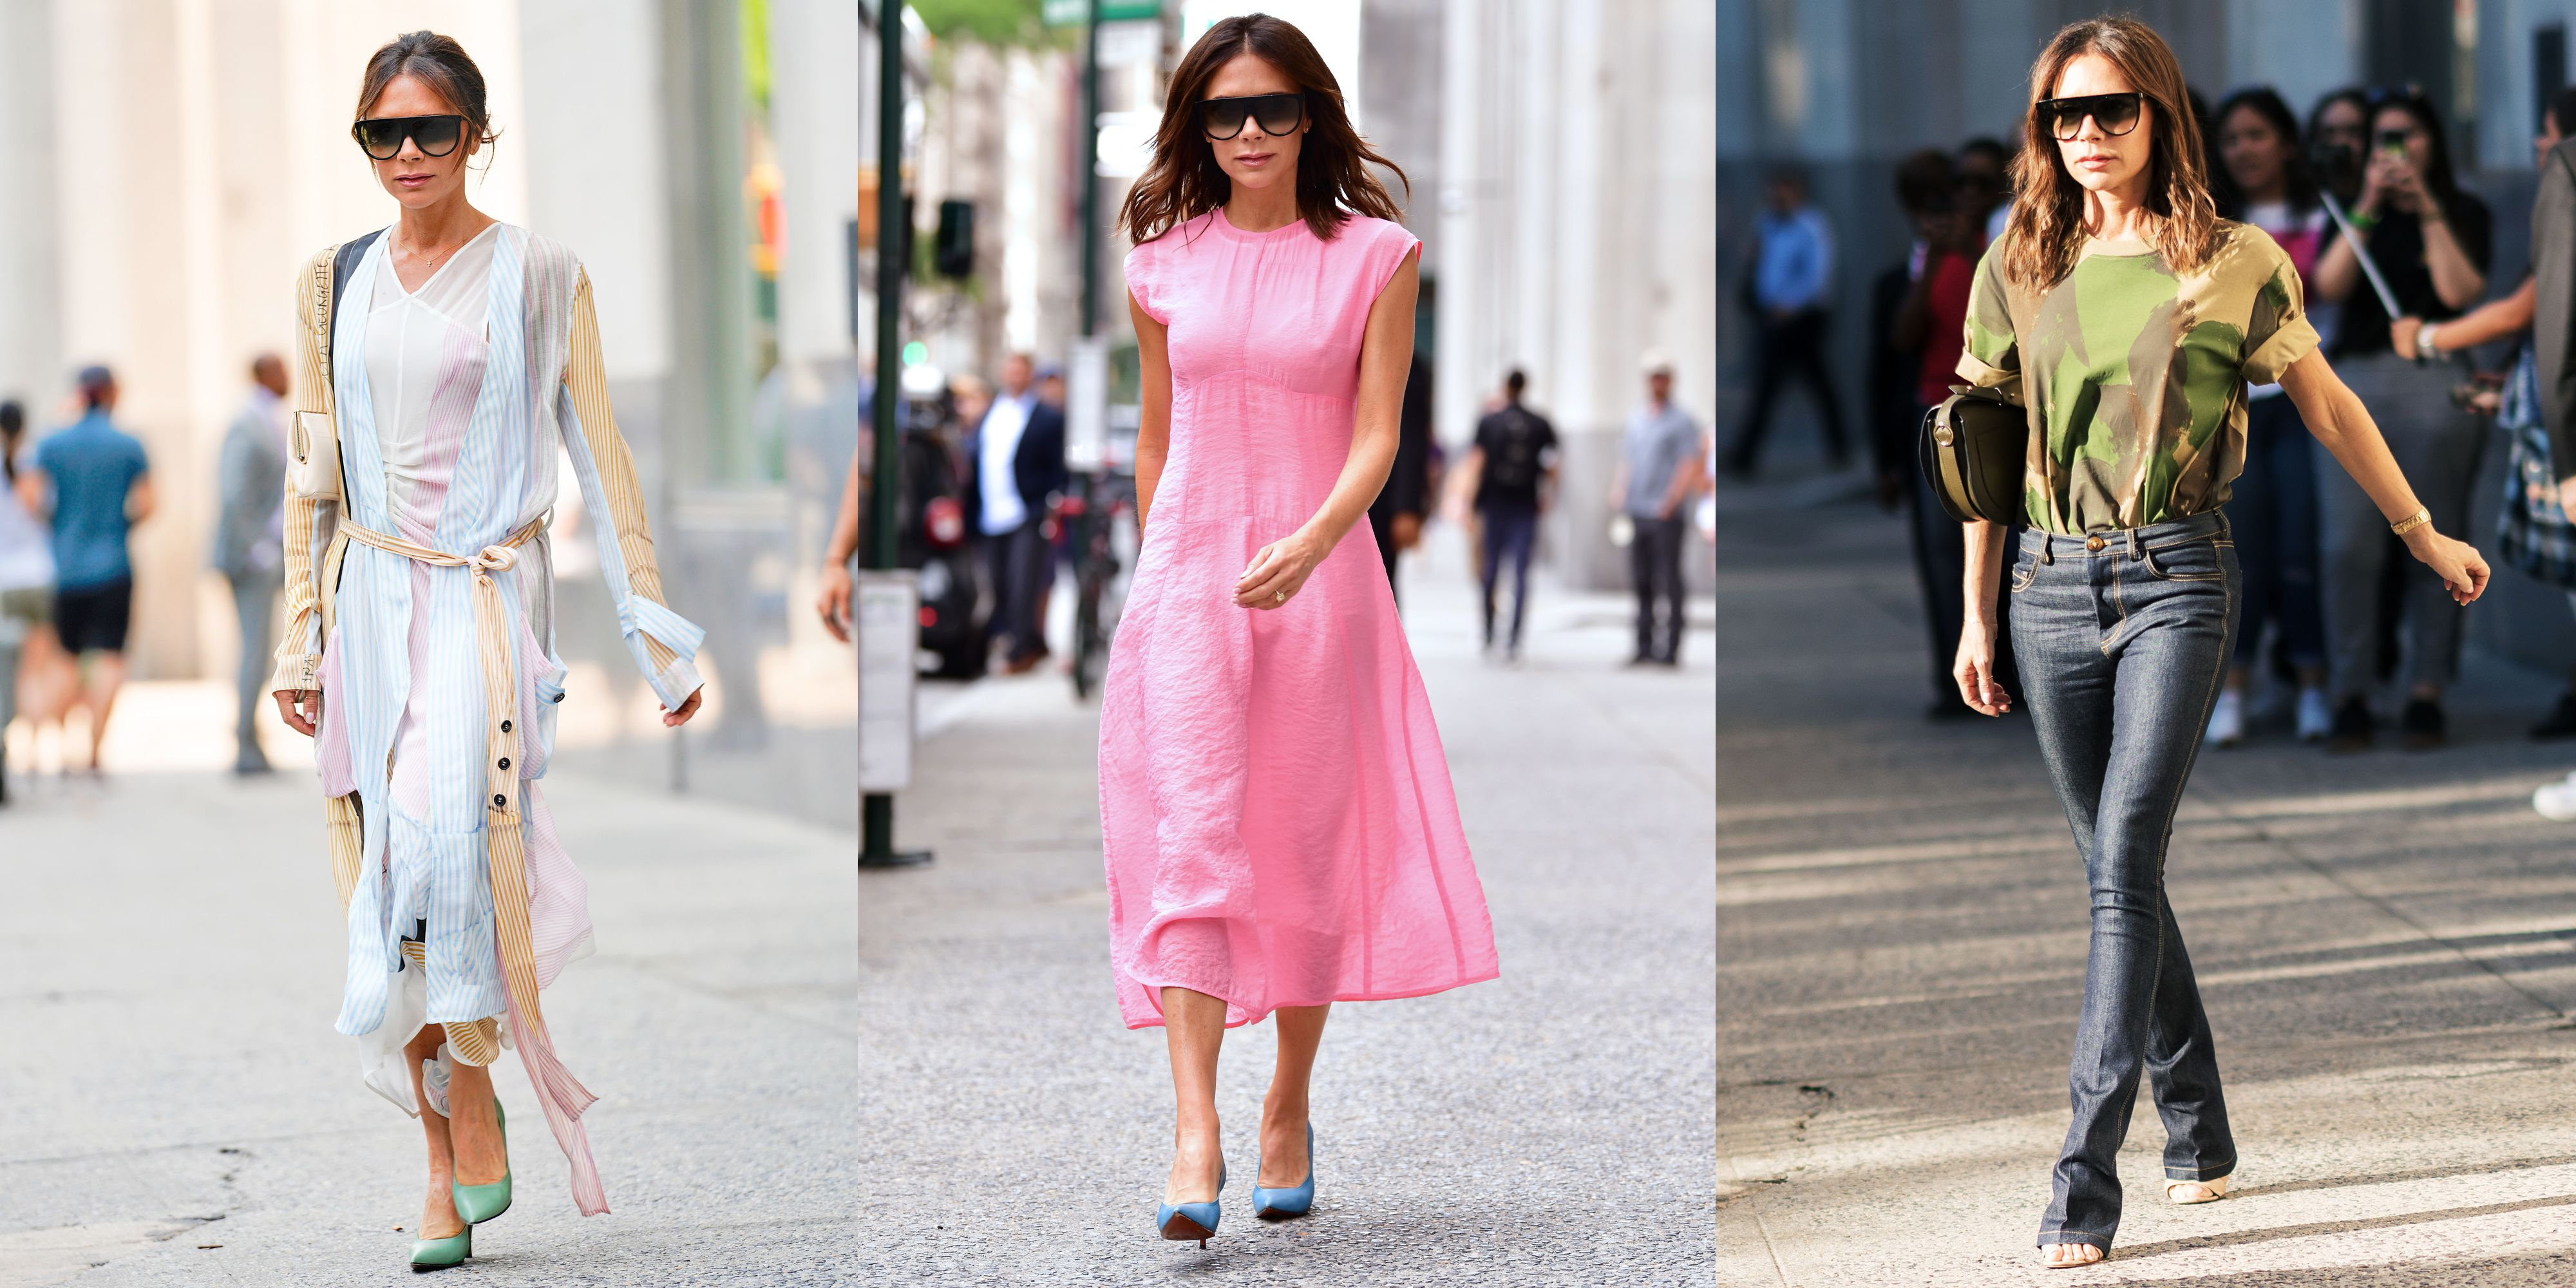 Victoria Beckham Wore a Bright Pink Dress in New York City